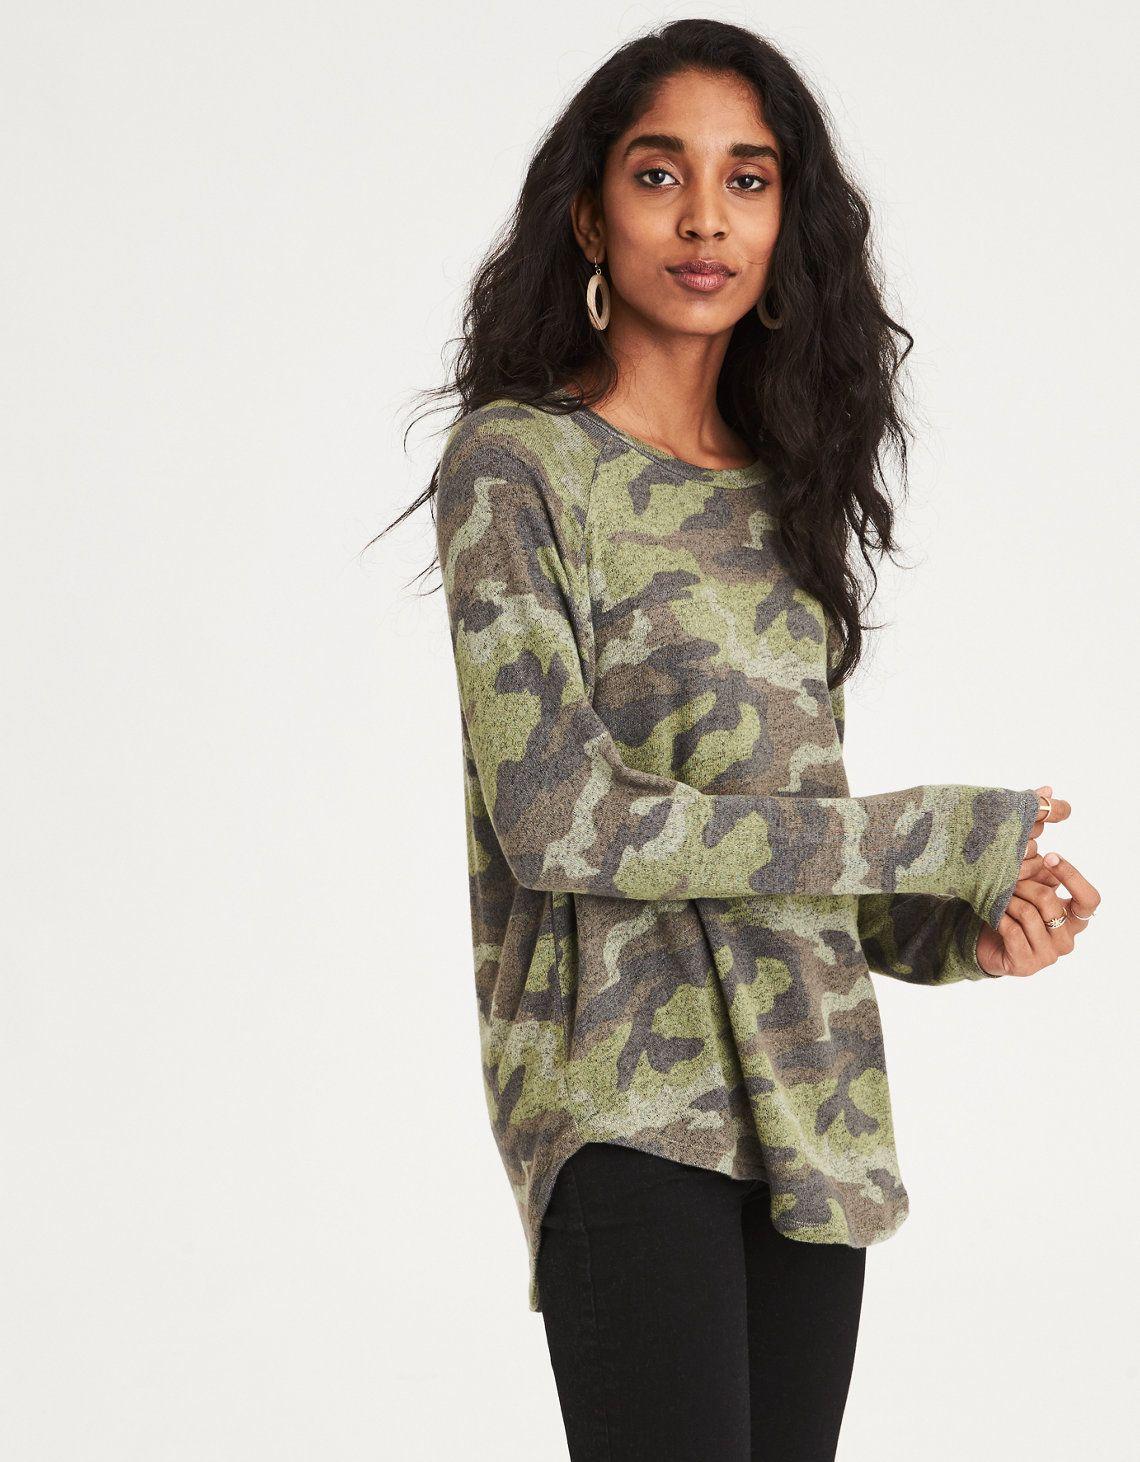 66be2729c0119 Image for the product Camo Sweatshirt, Camo Shirts, Crew Neck Sweatshirt, Camo  Leggings